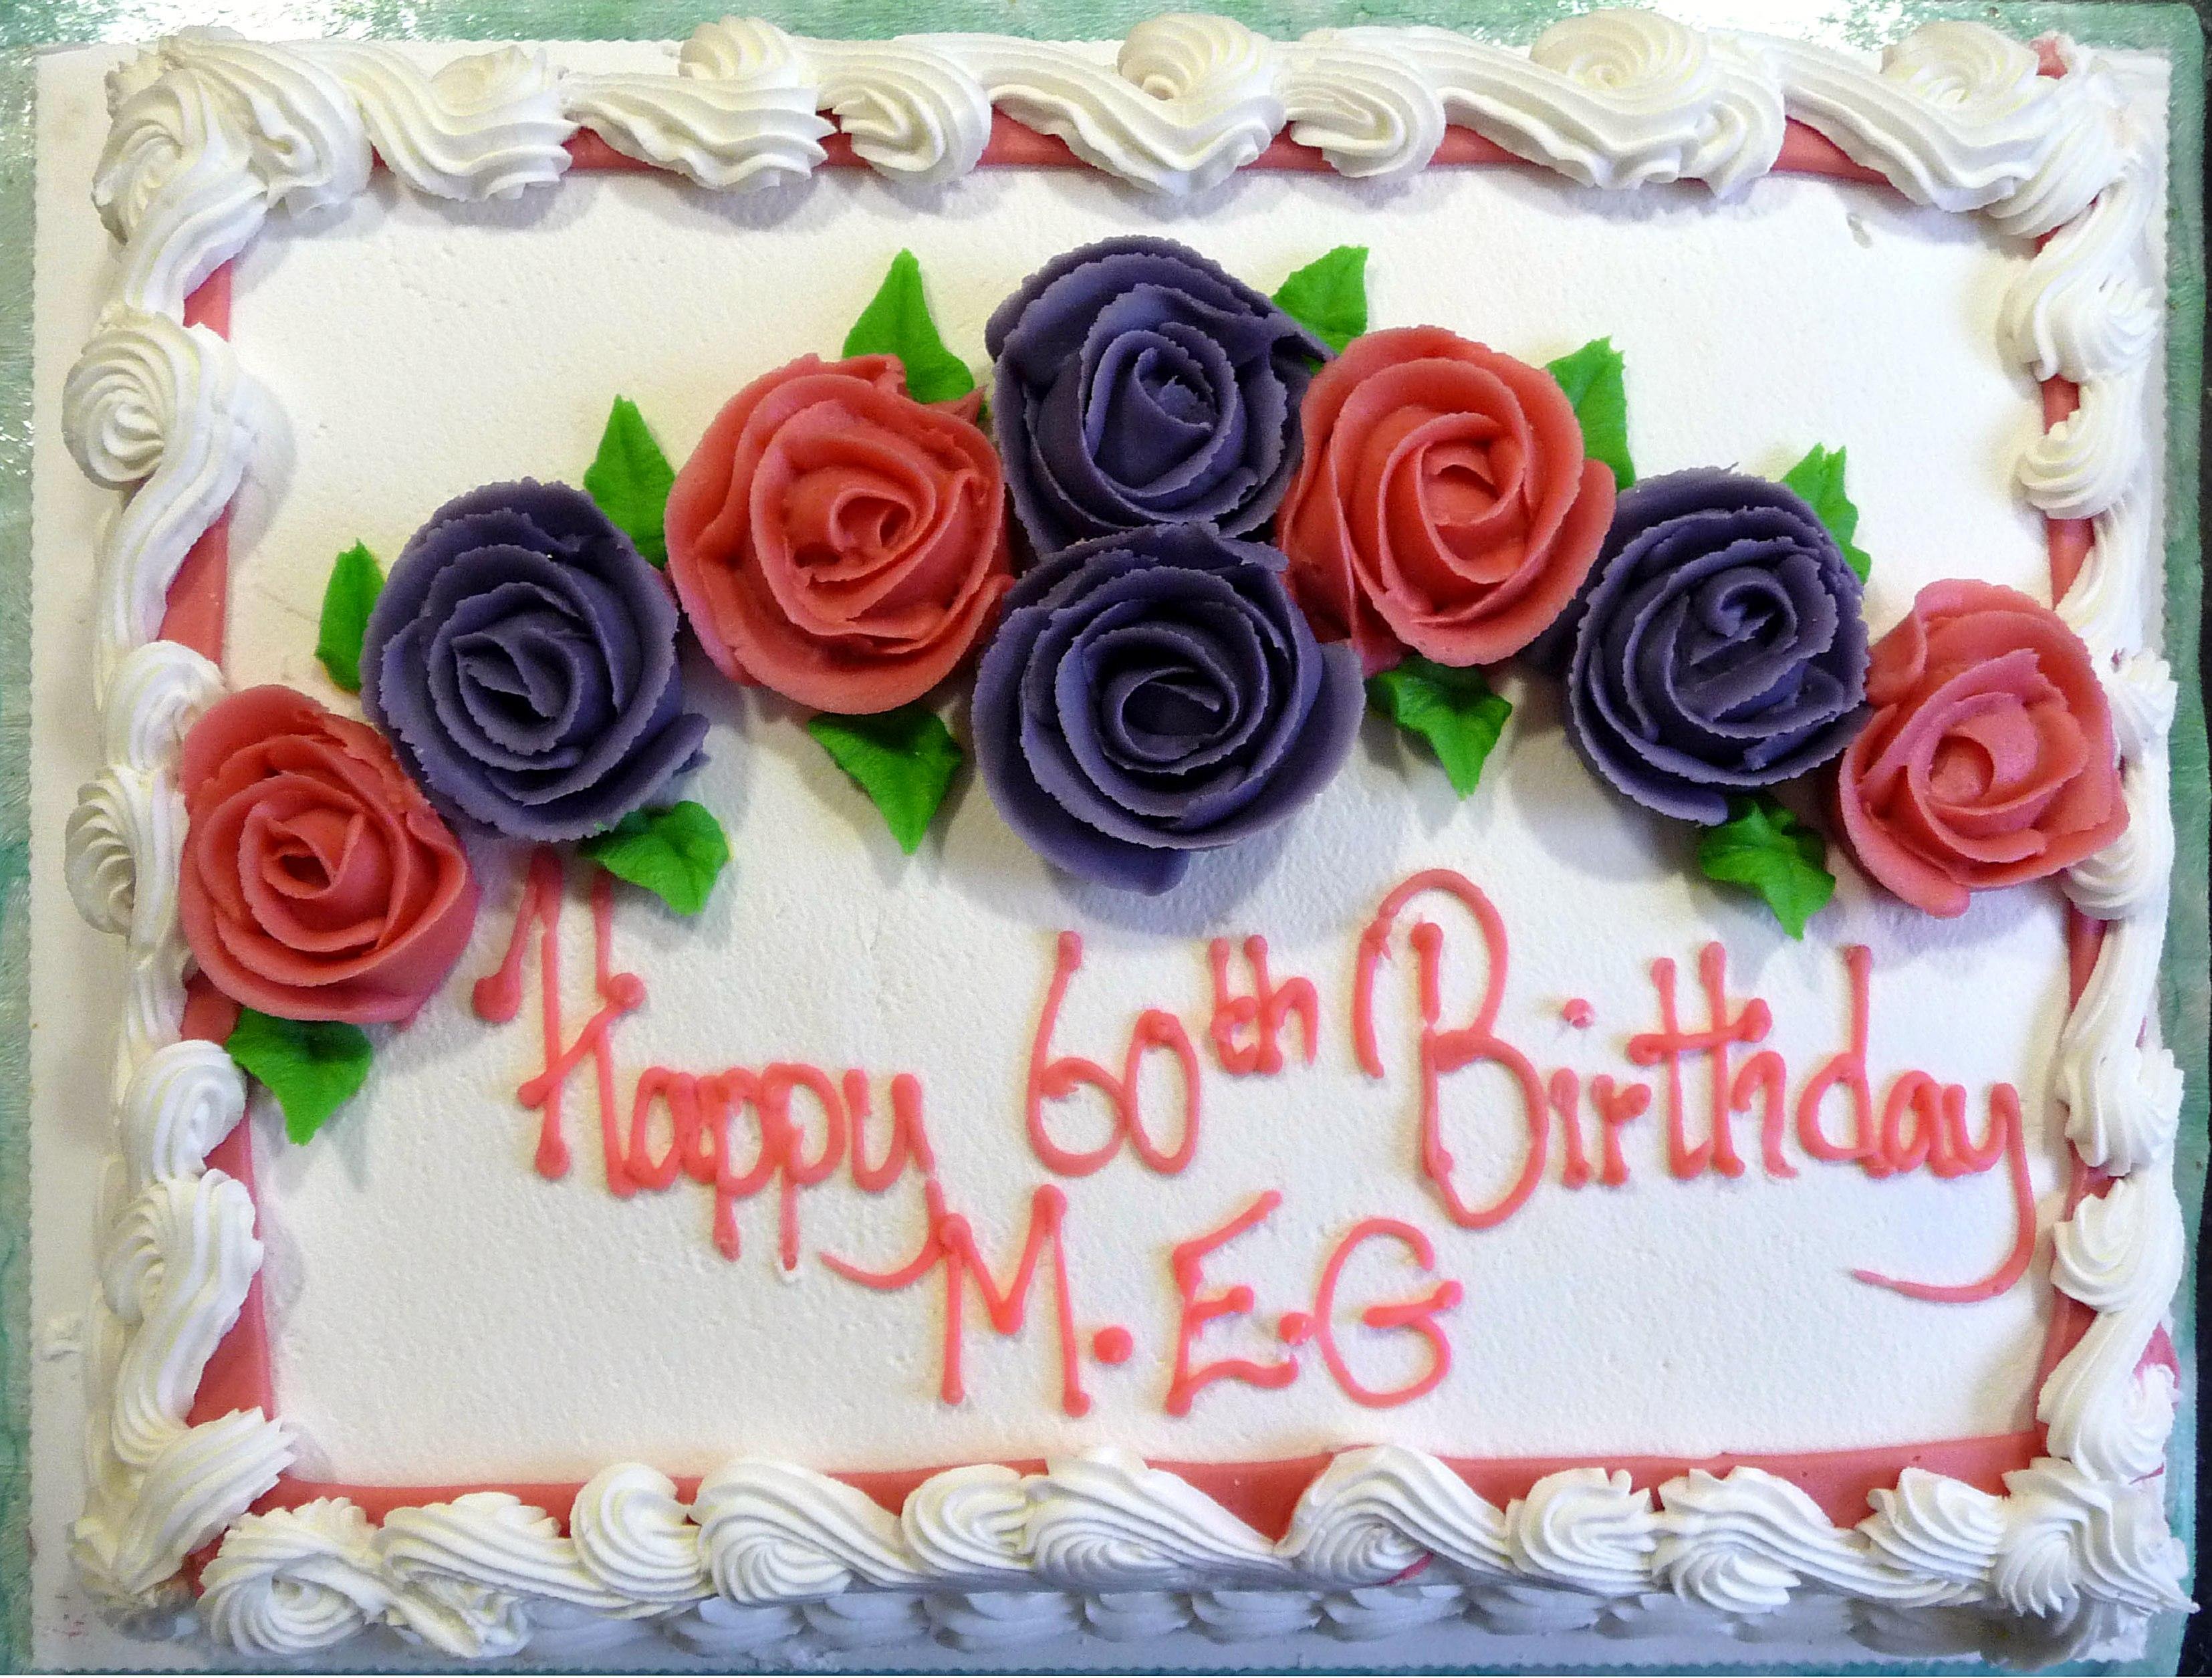 Merseyside E.G. 60th Anniversary Cake